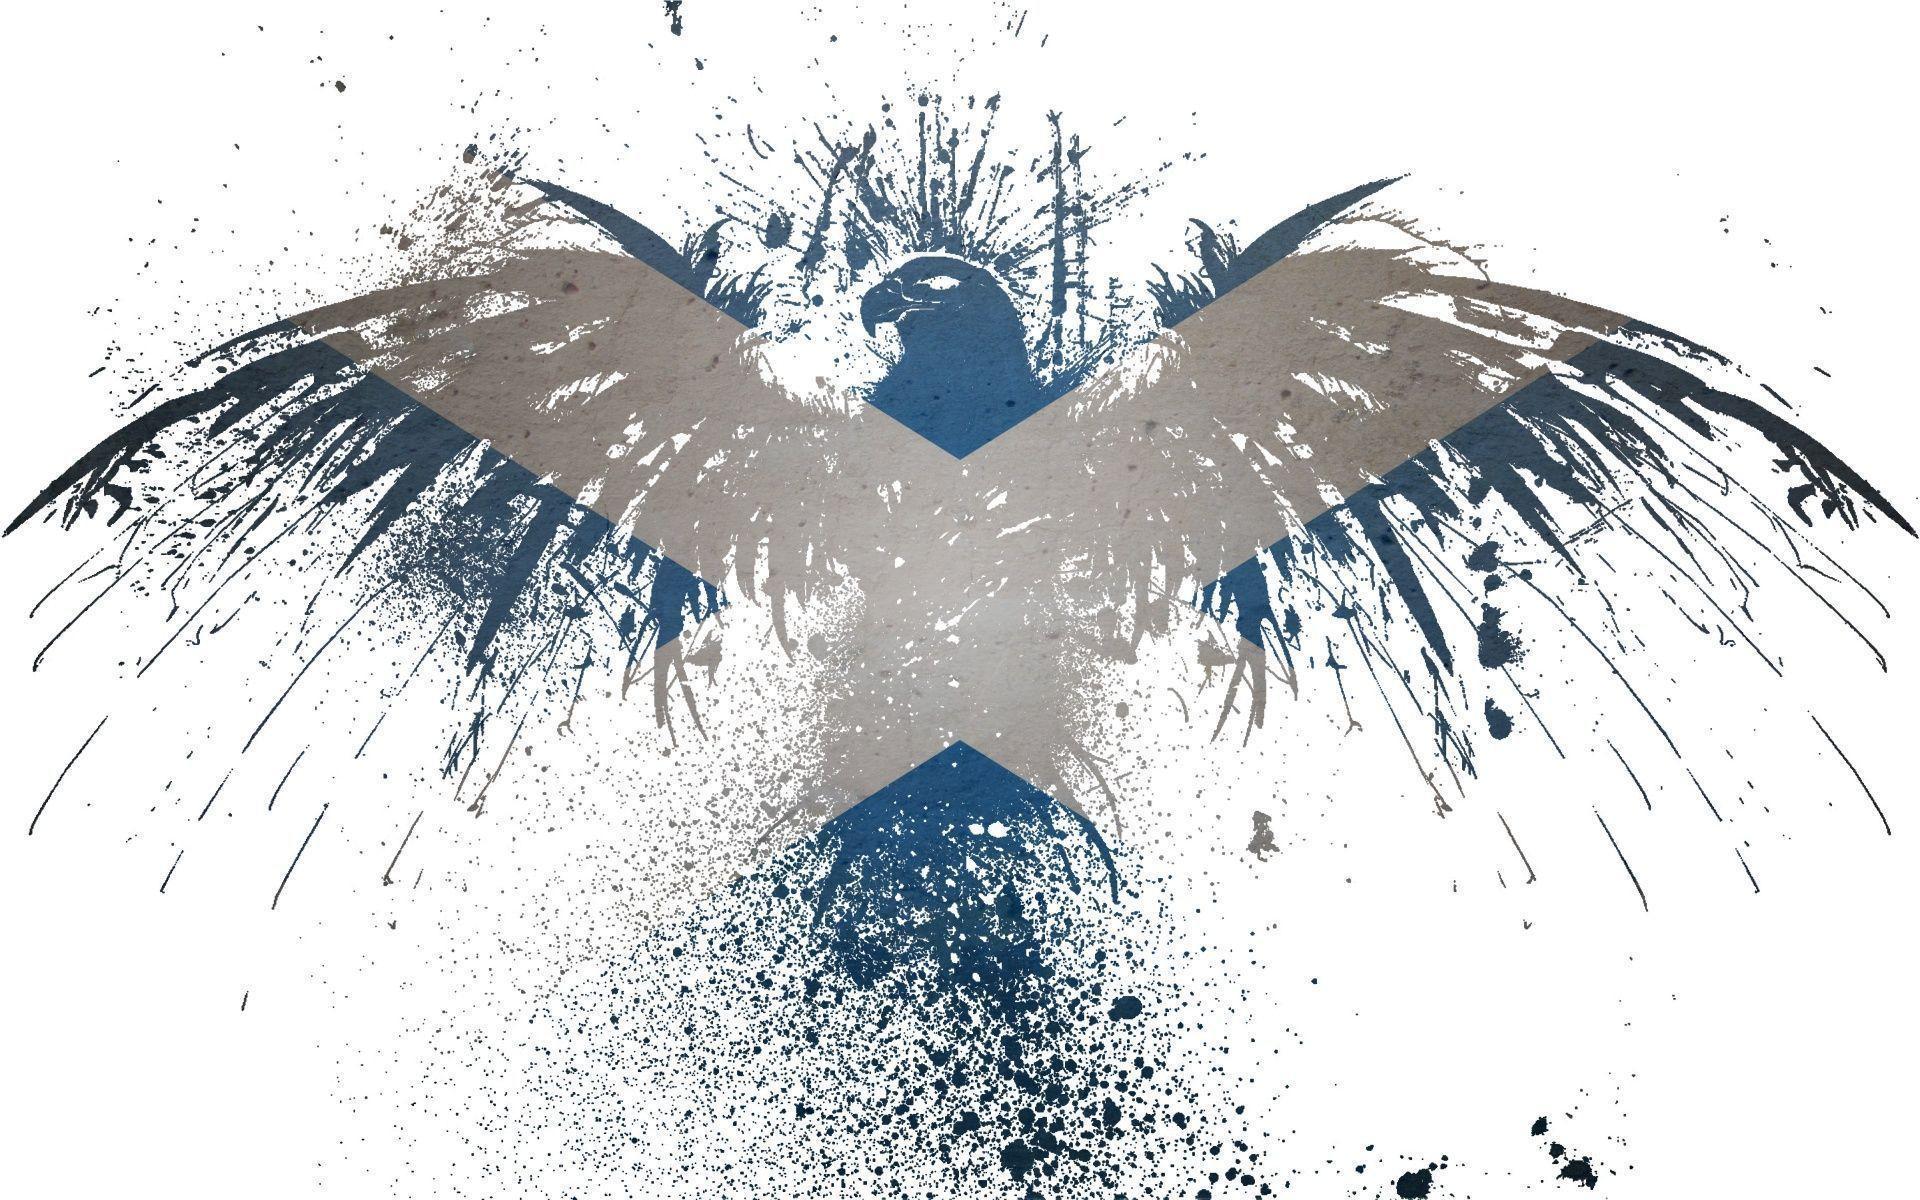 hd scotland flag wallpaper - photo #23